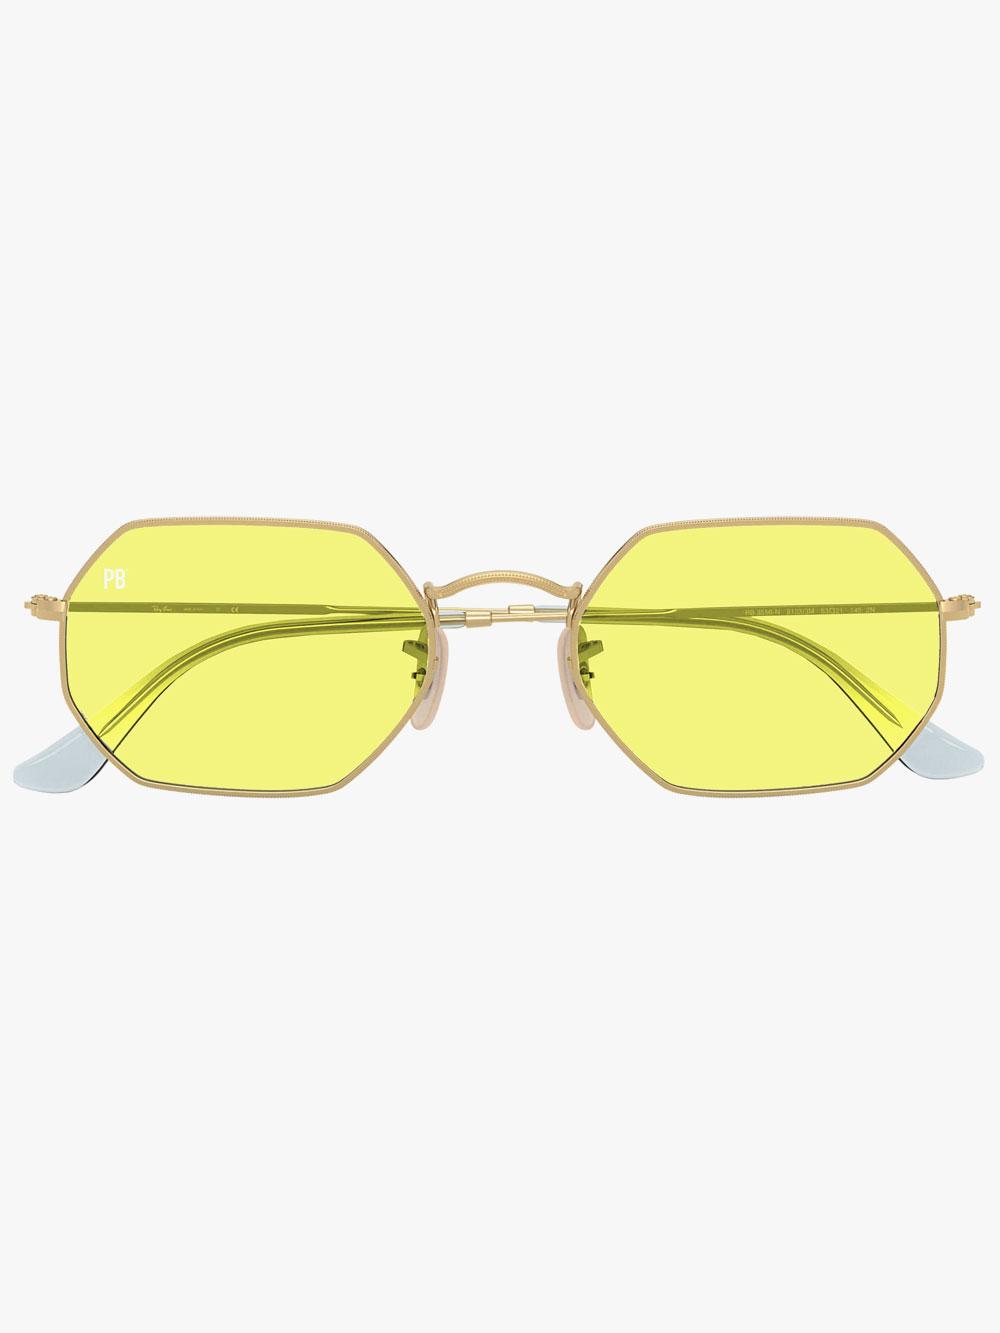 octa-yellow2